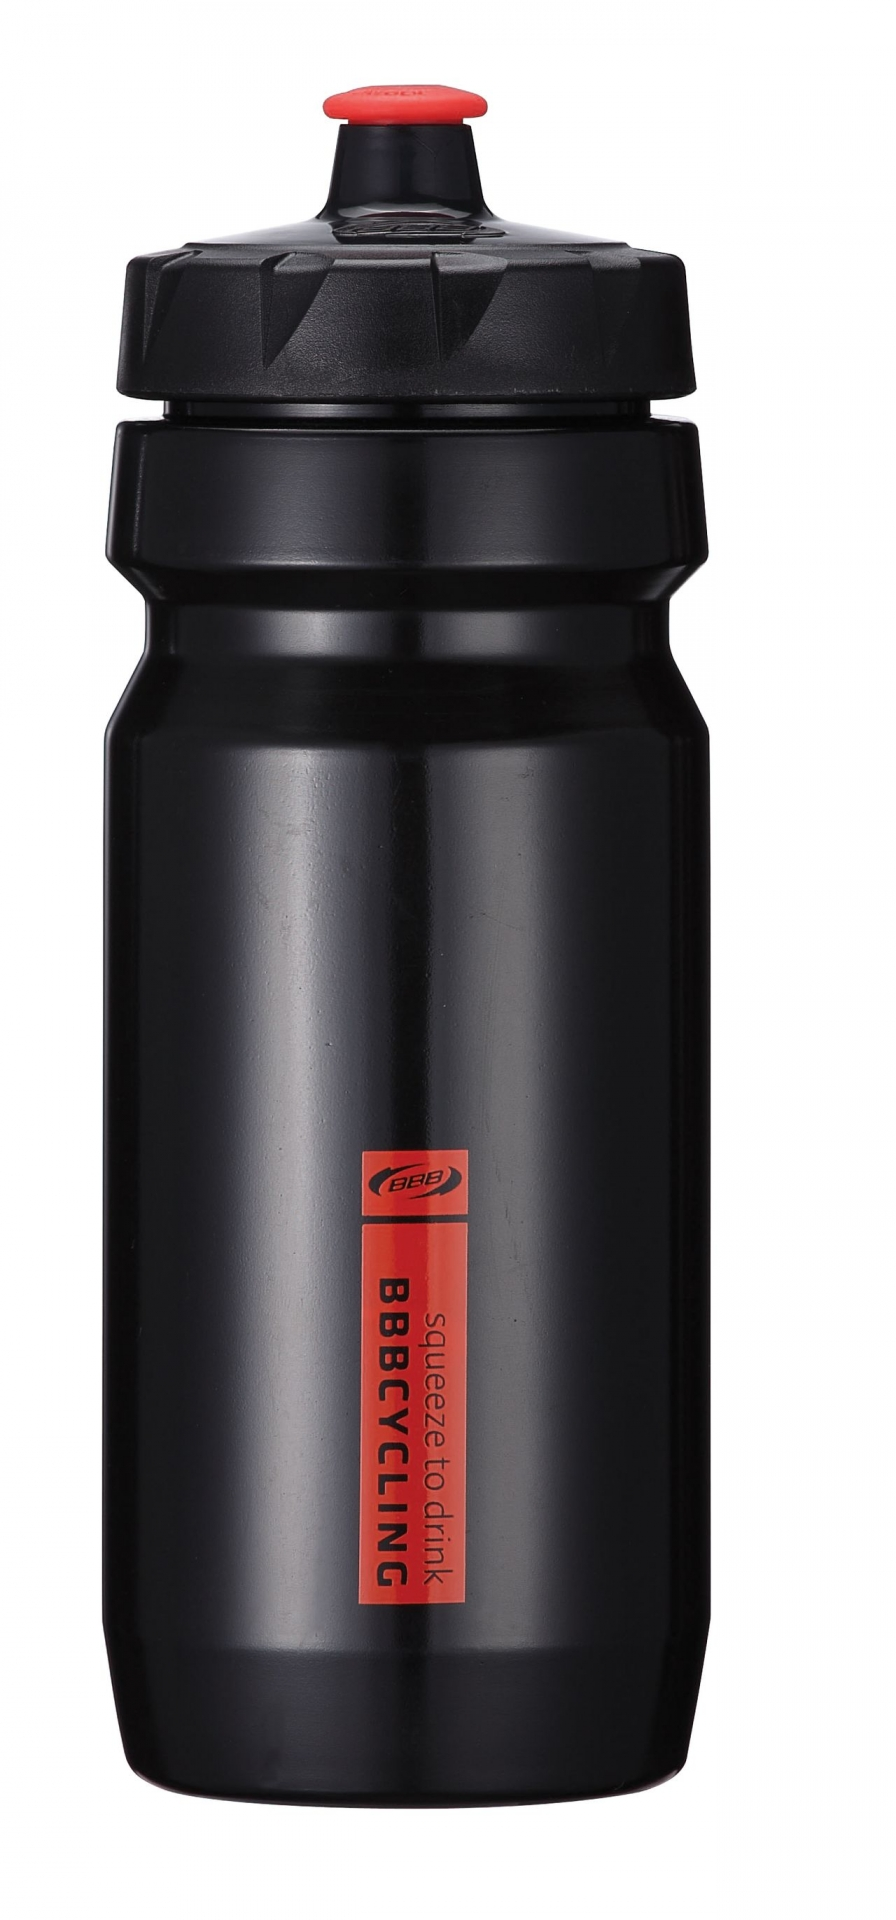 Bidon BBB CompTank 550 ml Noir/Rouge - BWB-01